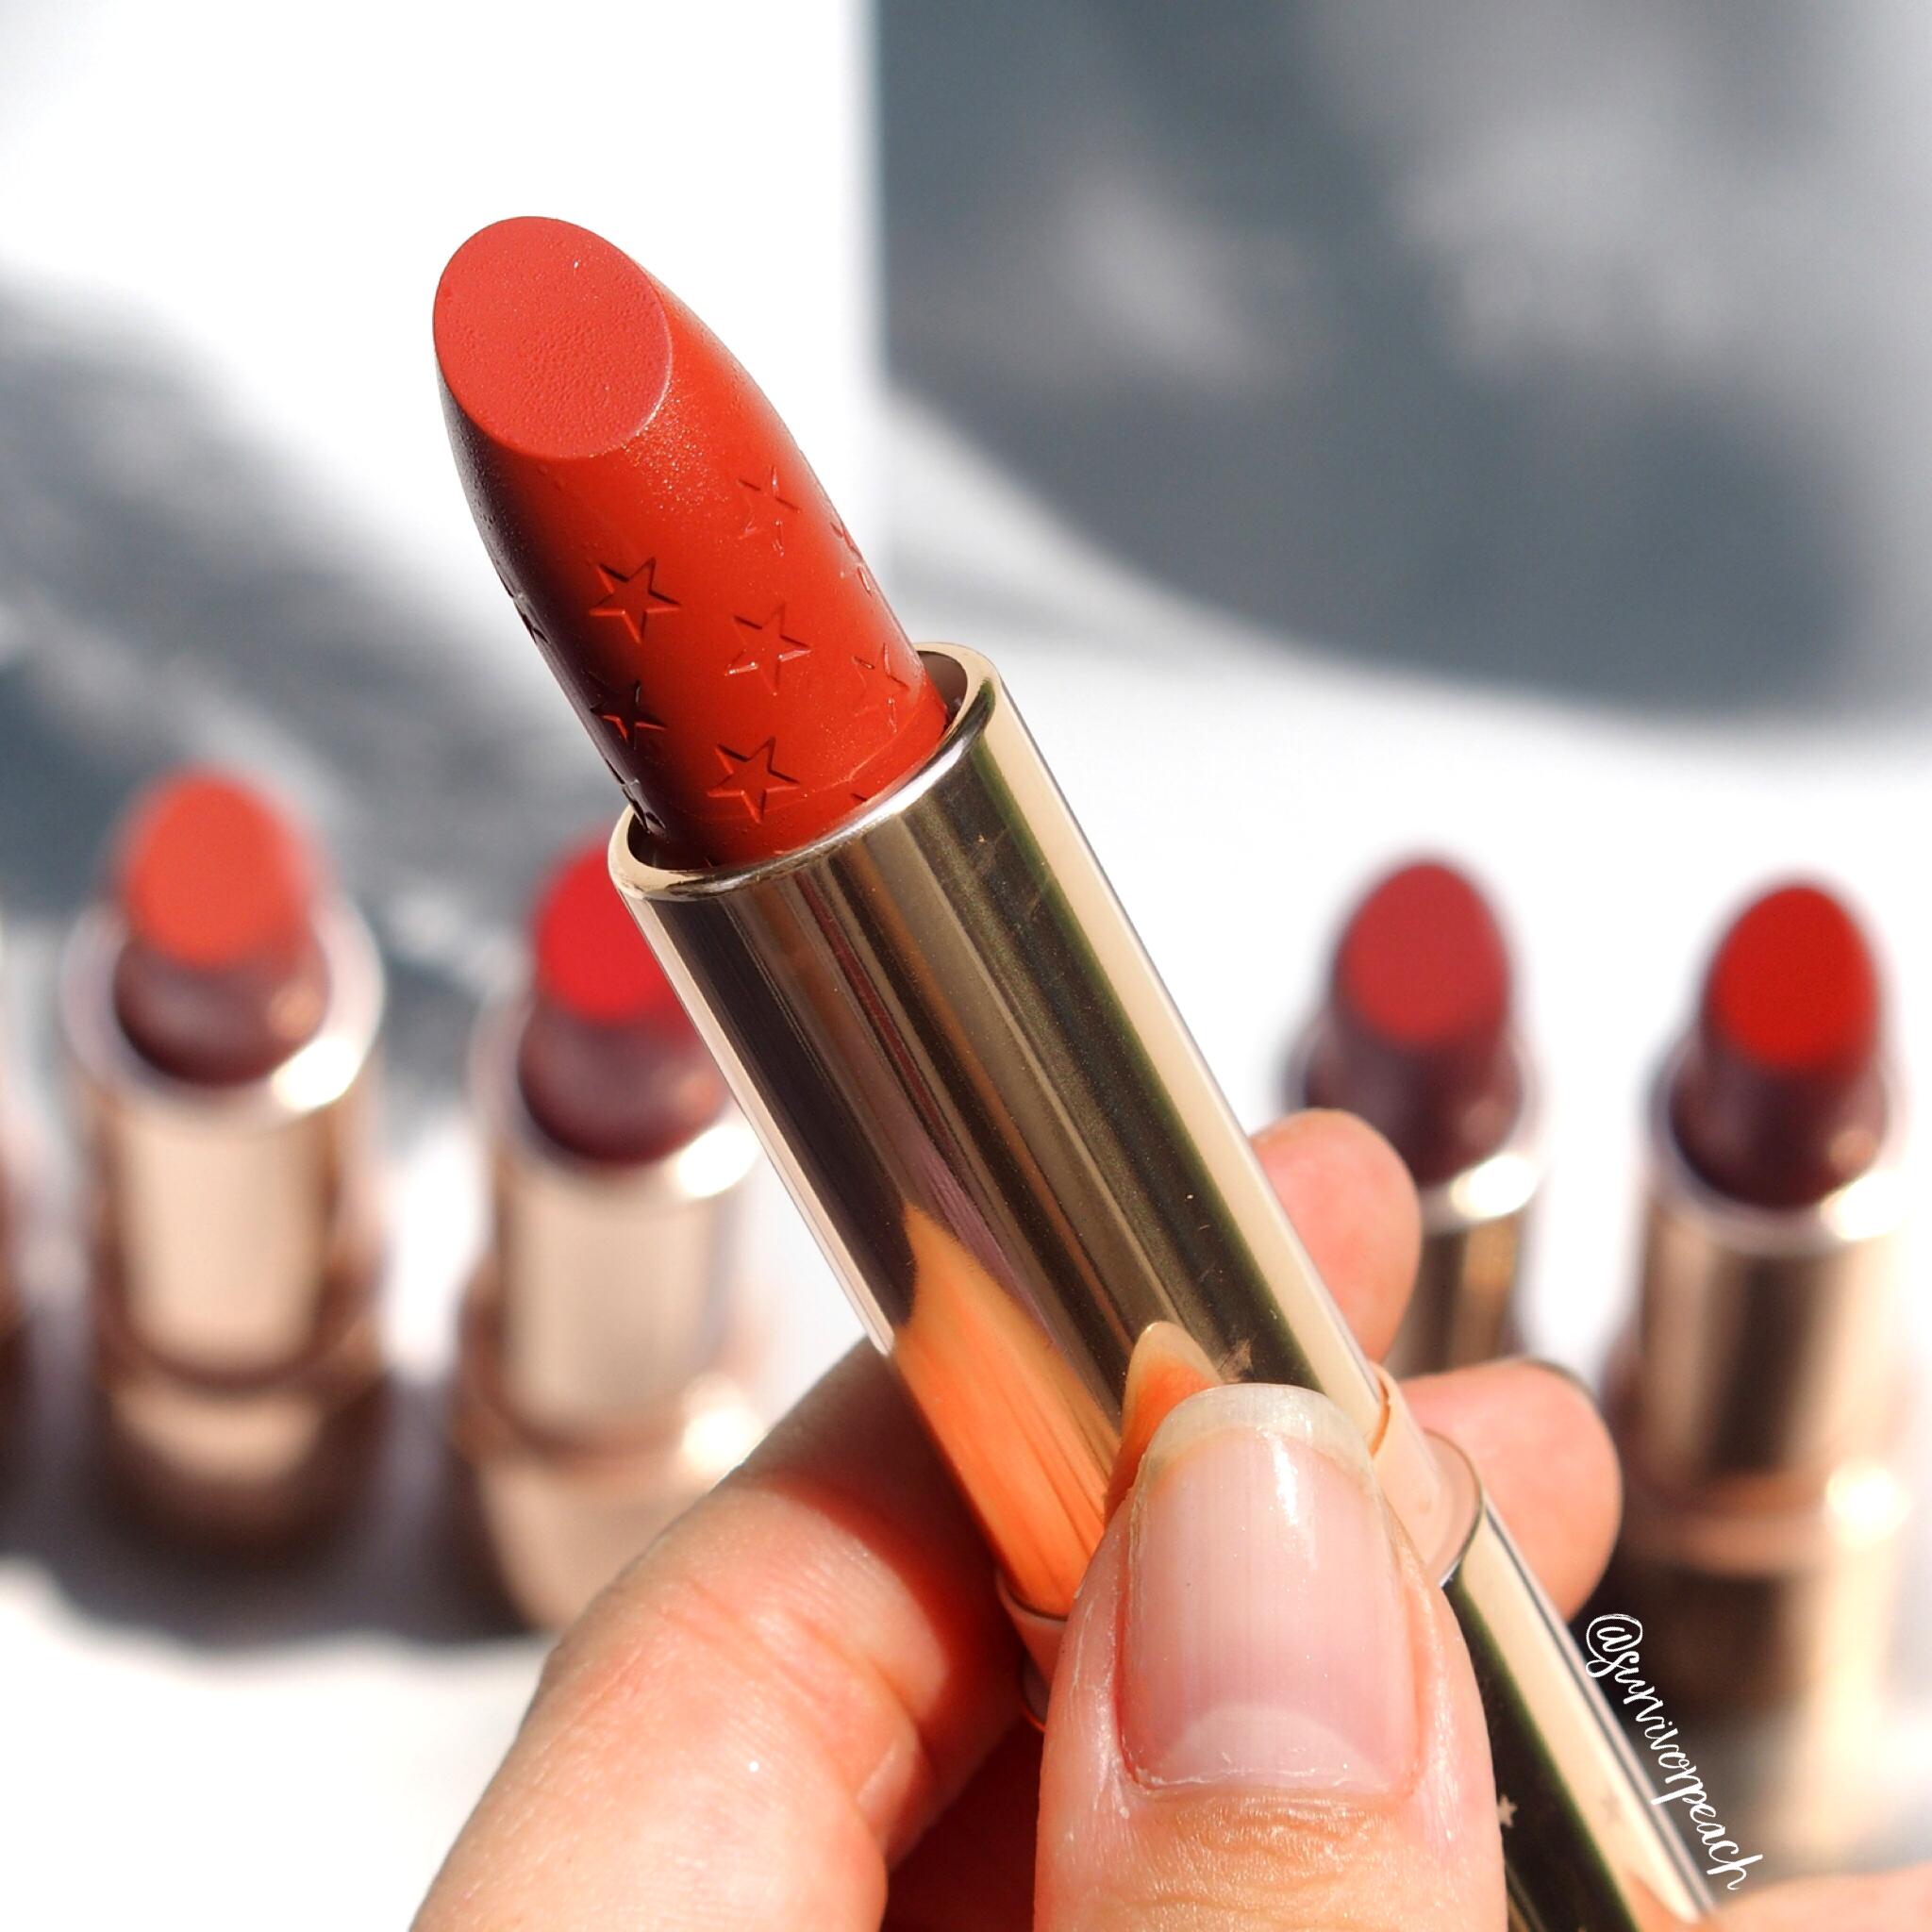 Colourpop Matte Lux Lipstick in Money Moves